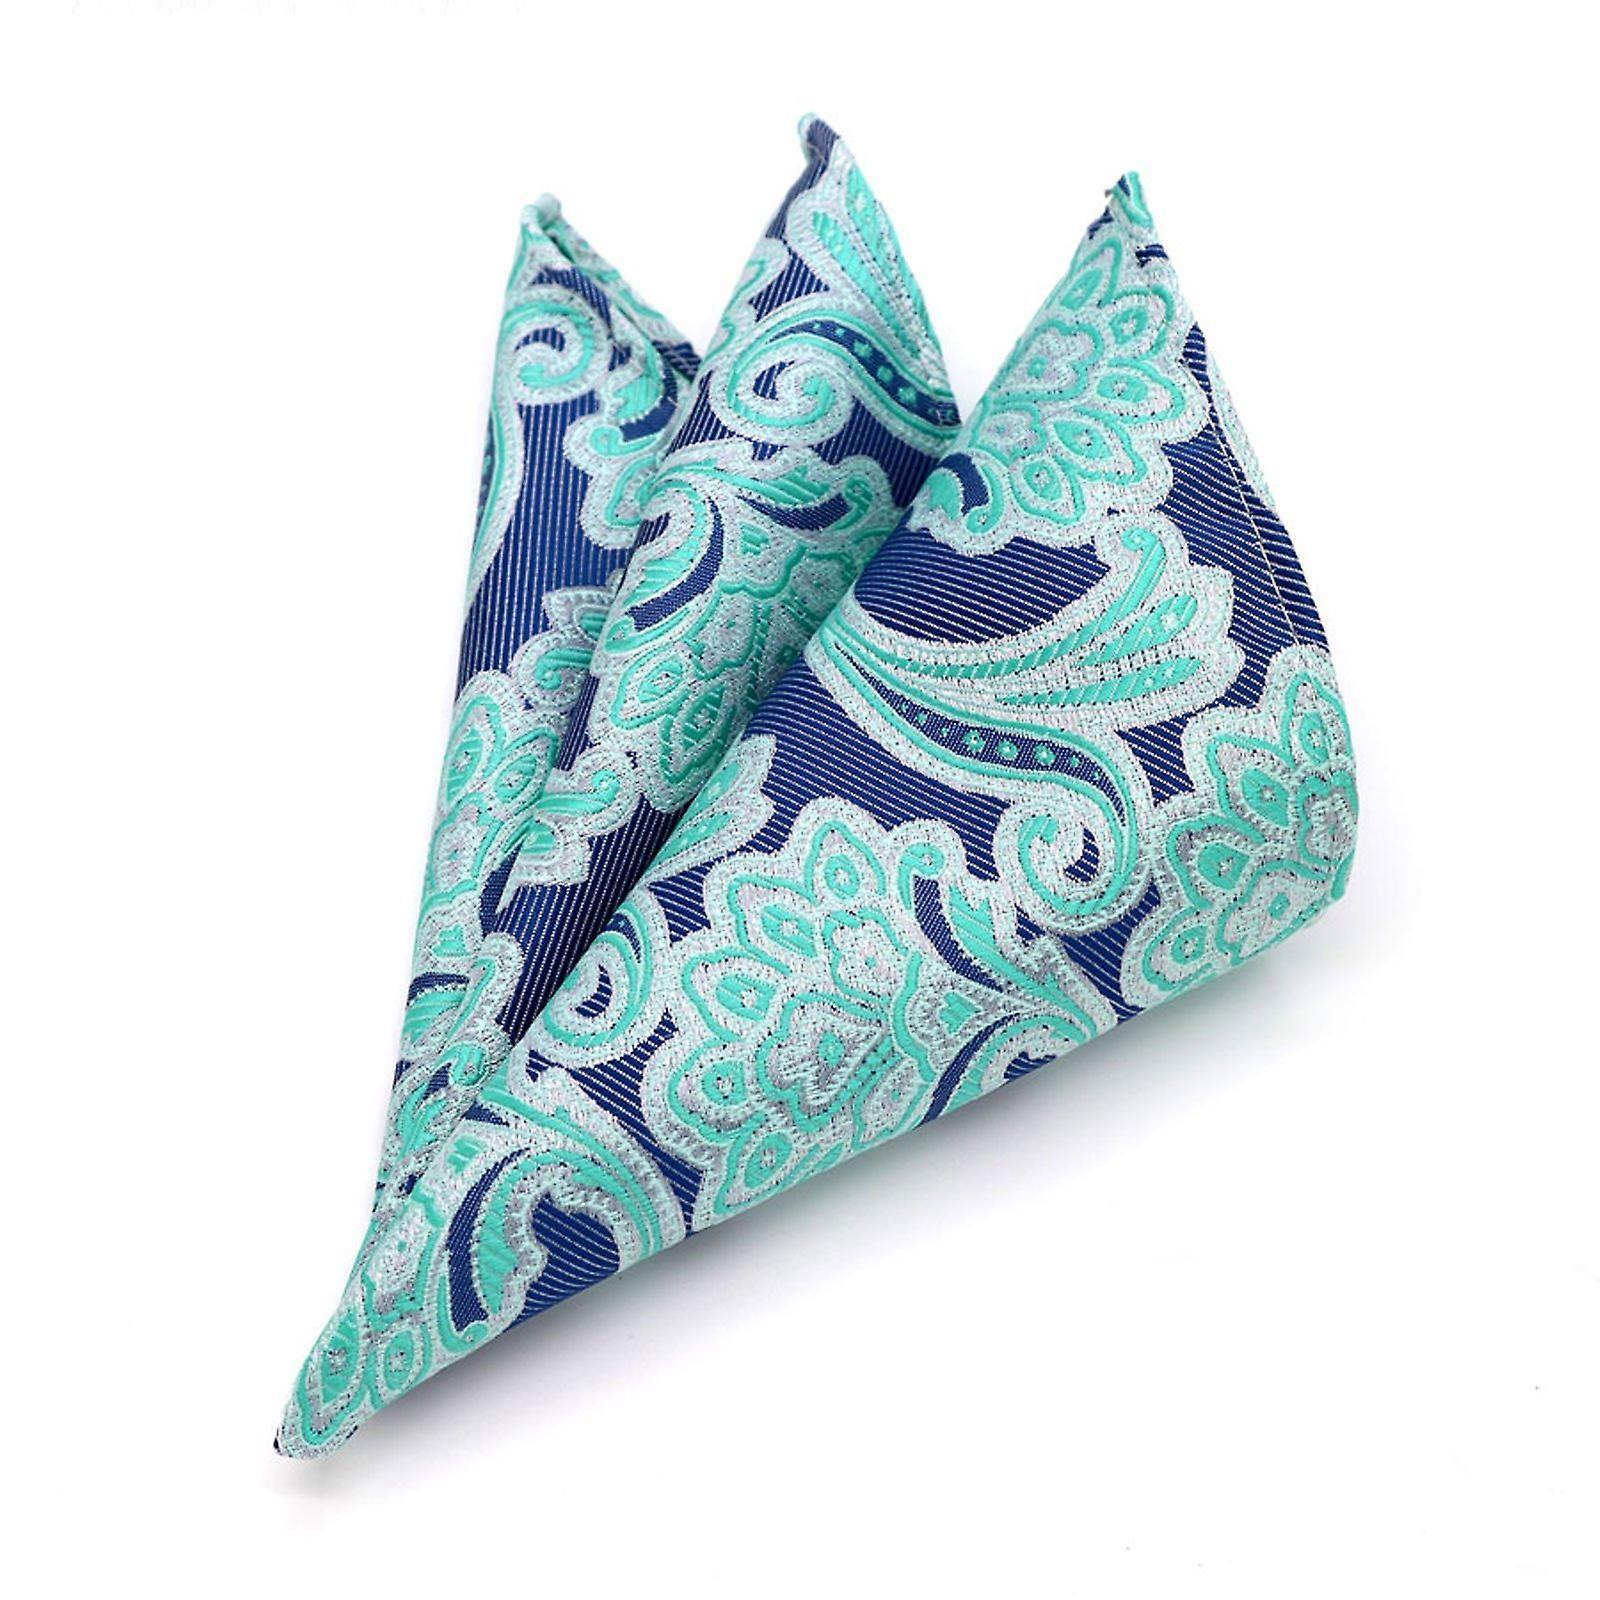 Mint green & purple paisley pattern men's pocket square